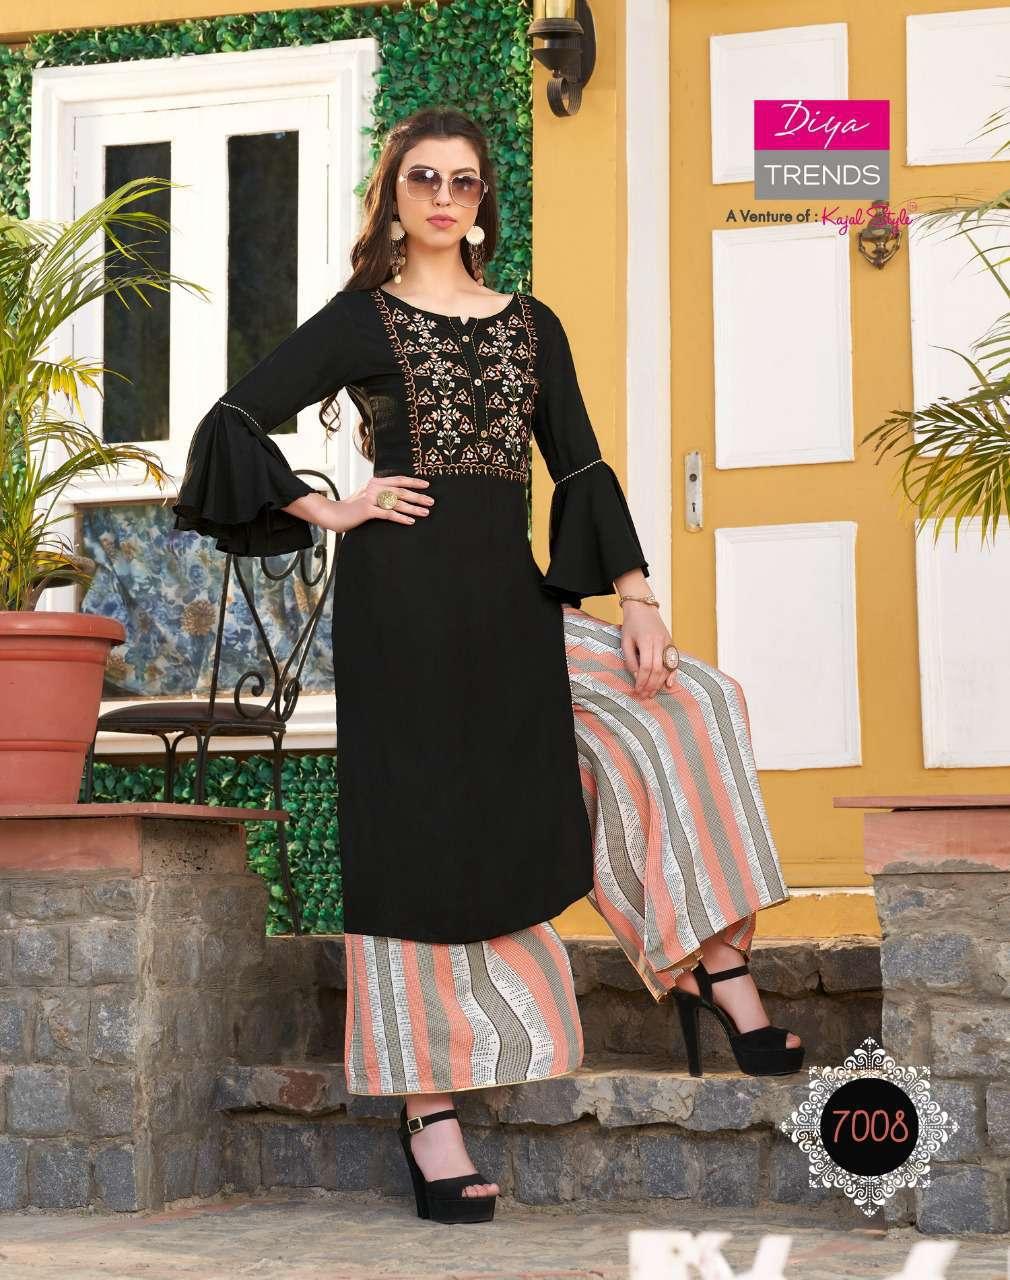 Diya Trends Bibas Vol 7 by Kajal Style Kurti with Palazzo Pant Wholesale Catalog 14 Pcs 12 - Diya Trends Biba's Vol 7 by Kajal Style Kurti with Palazzo Pant Wholesale Catalog 14 Pcs